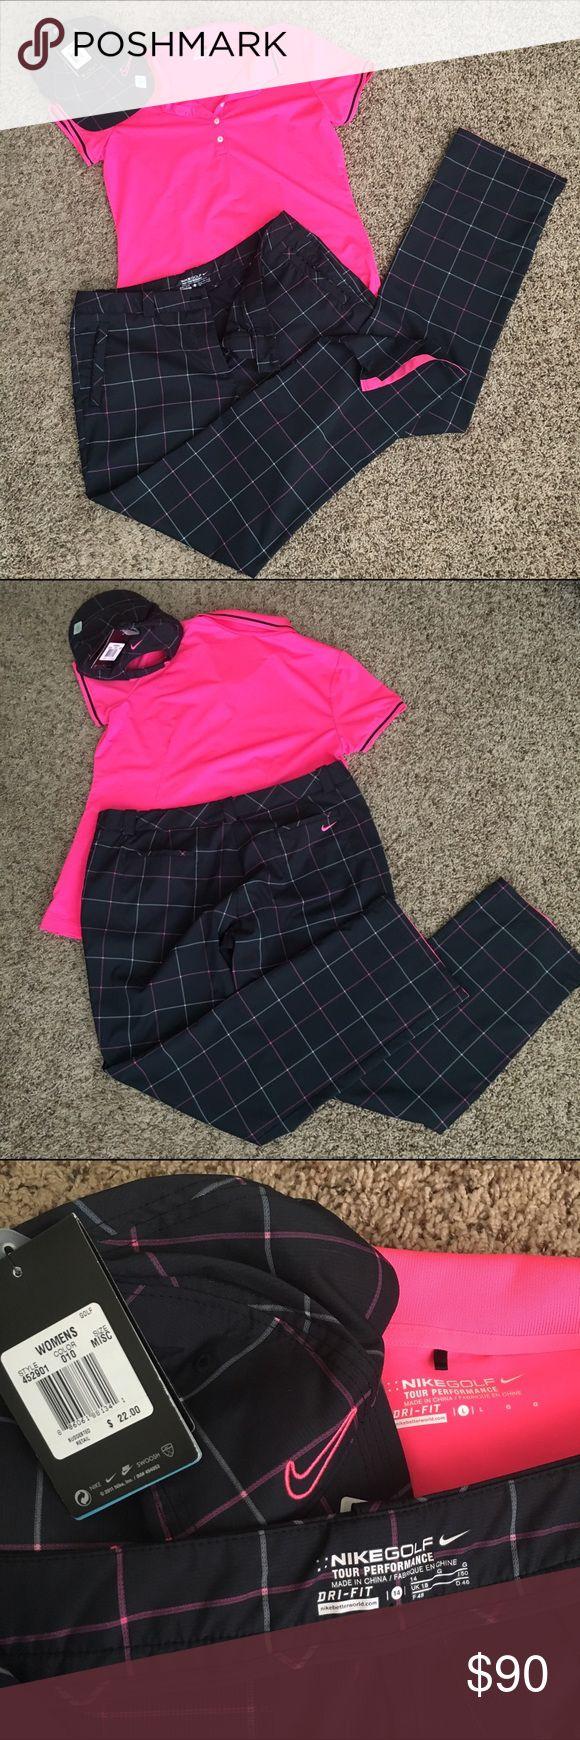 Design your own t-shirt hot pink - Nike Golf Tour Performance Outfit Golf Tourhot Pink Shirtsplaid